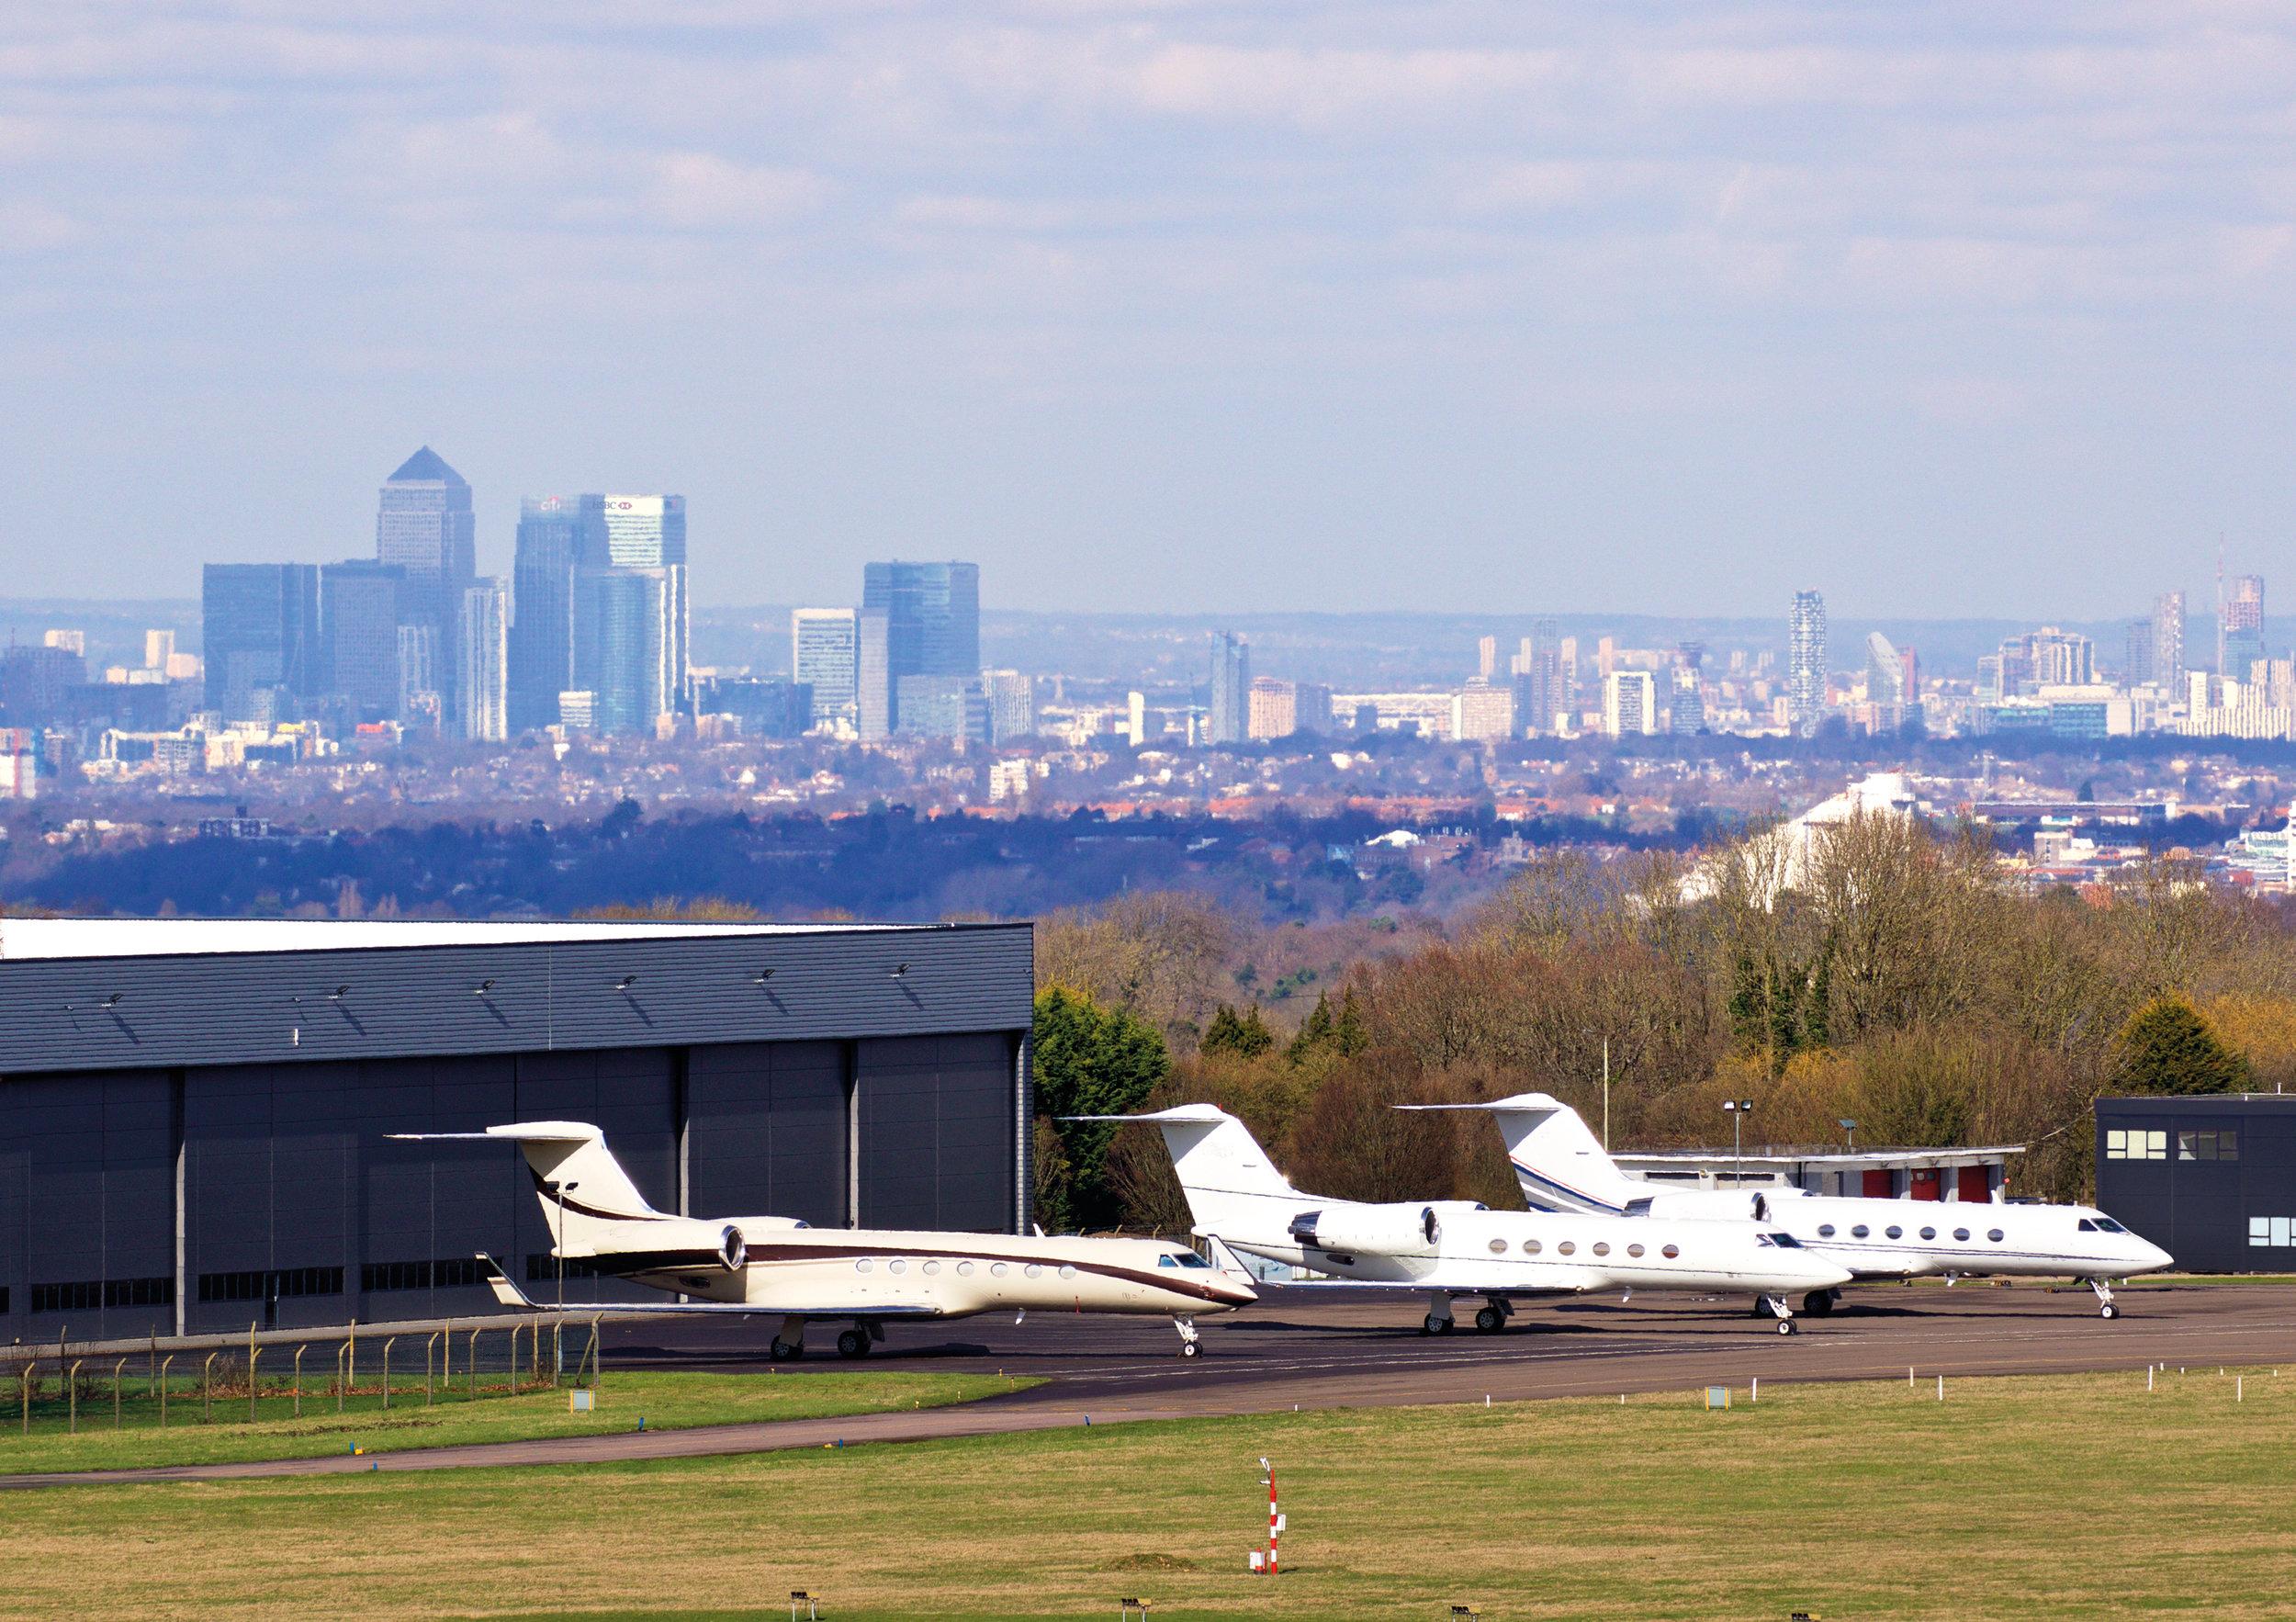 LDN007 - London Biggin Hill - Gulfstreams and Canary Wharf.jpg